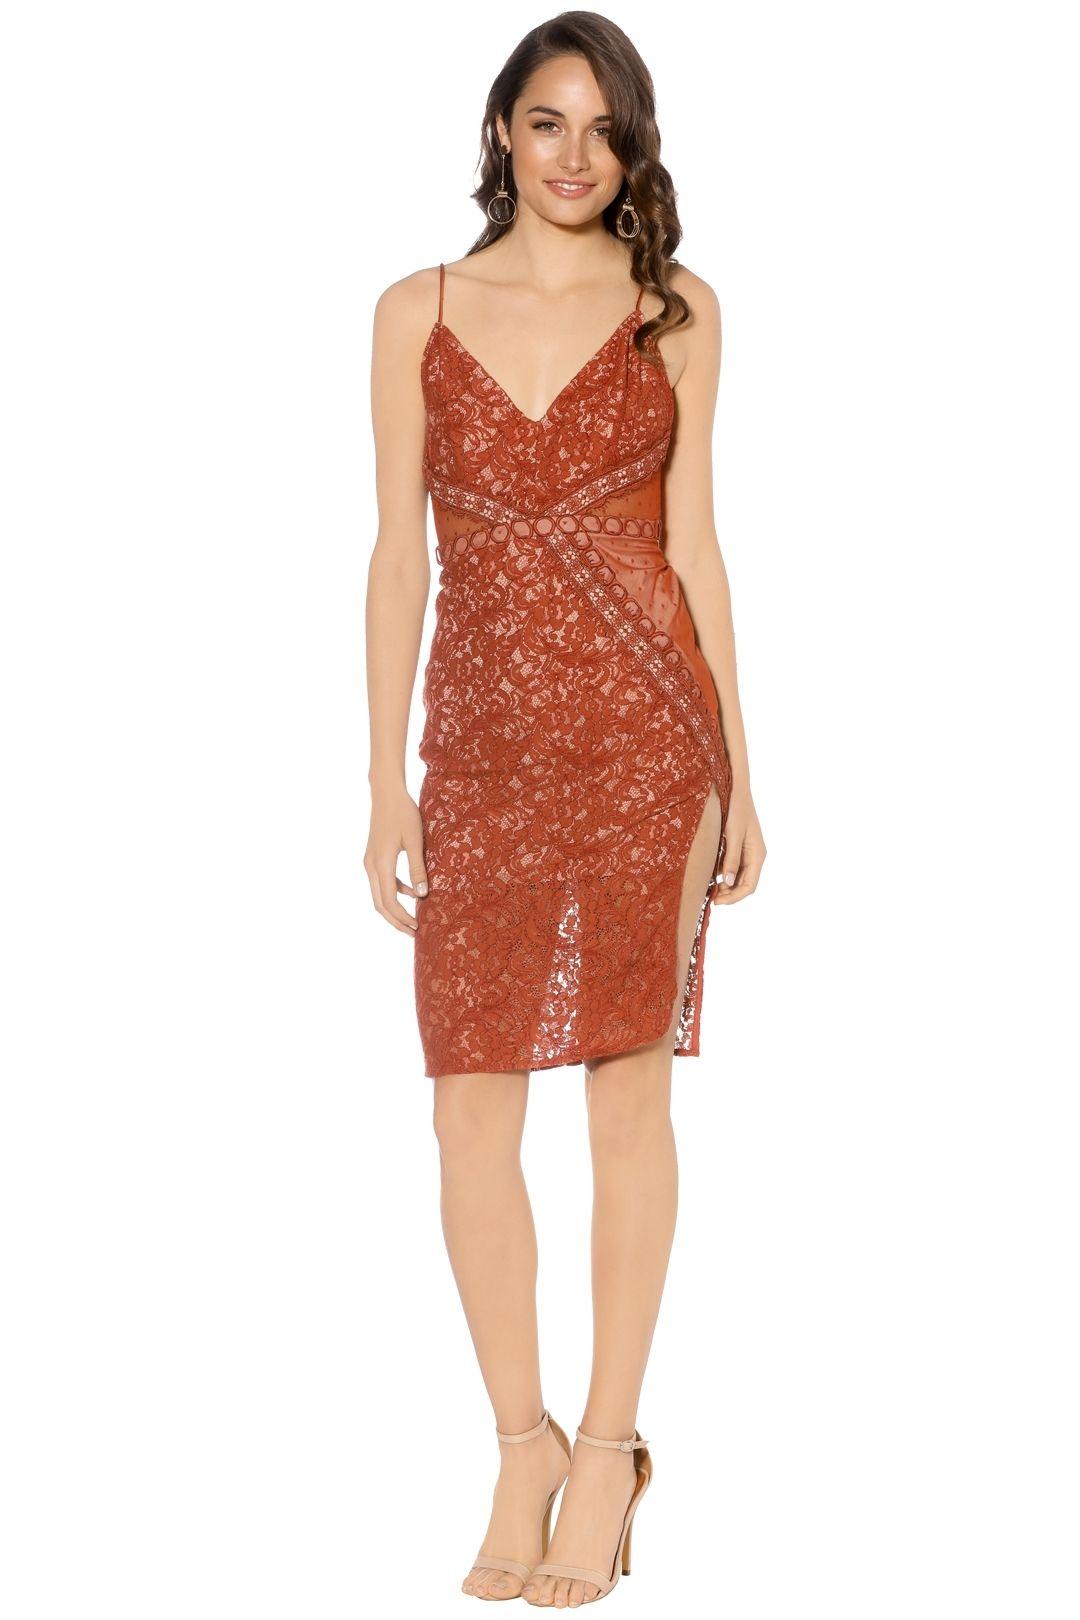 Stylestalker - Laylor Midi Dress - Orange - Front